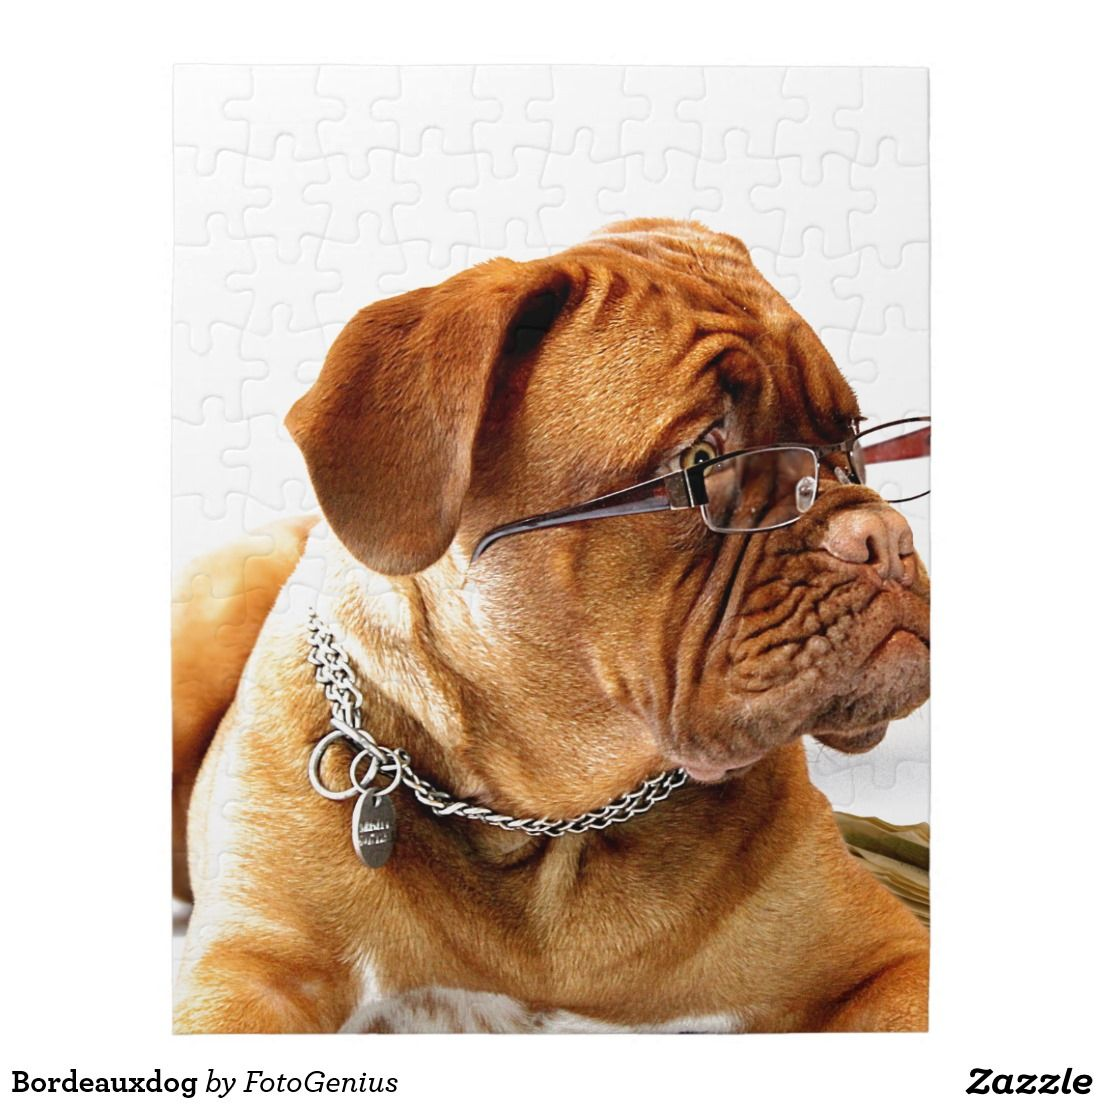 Bordeauxdog Jigsaw Puzzle